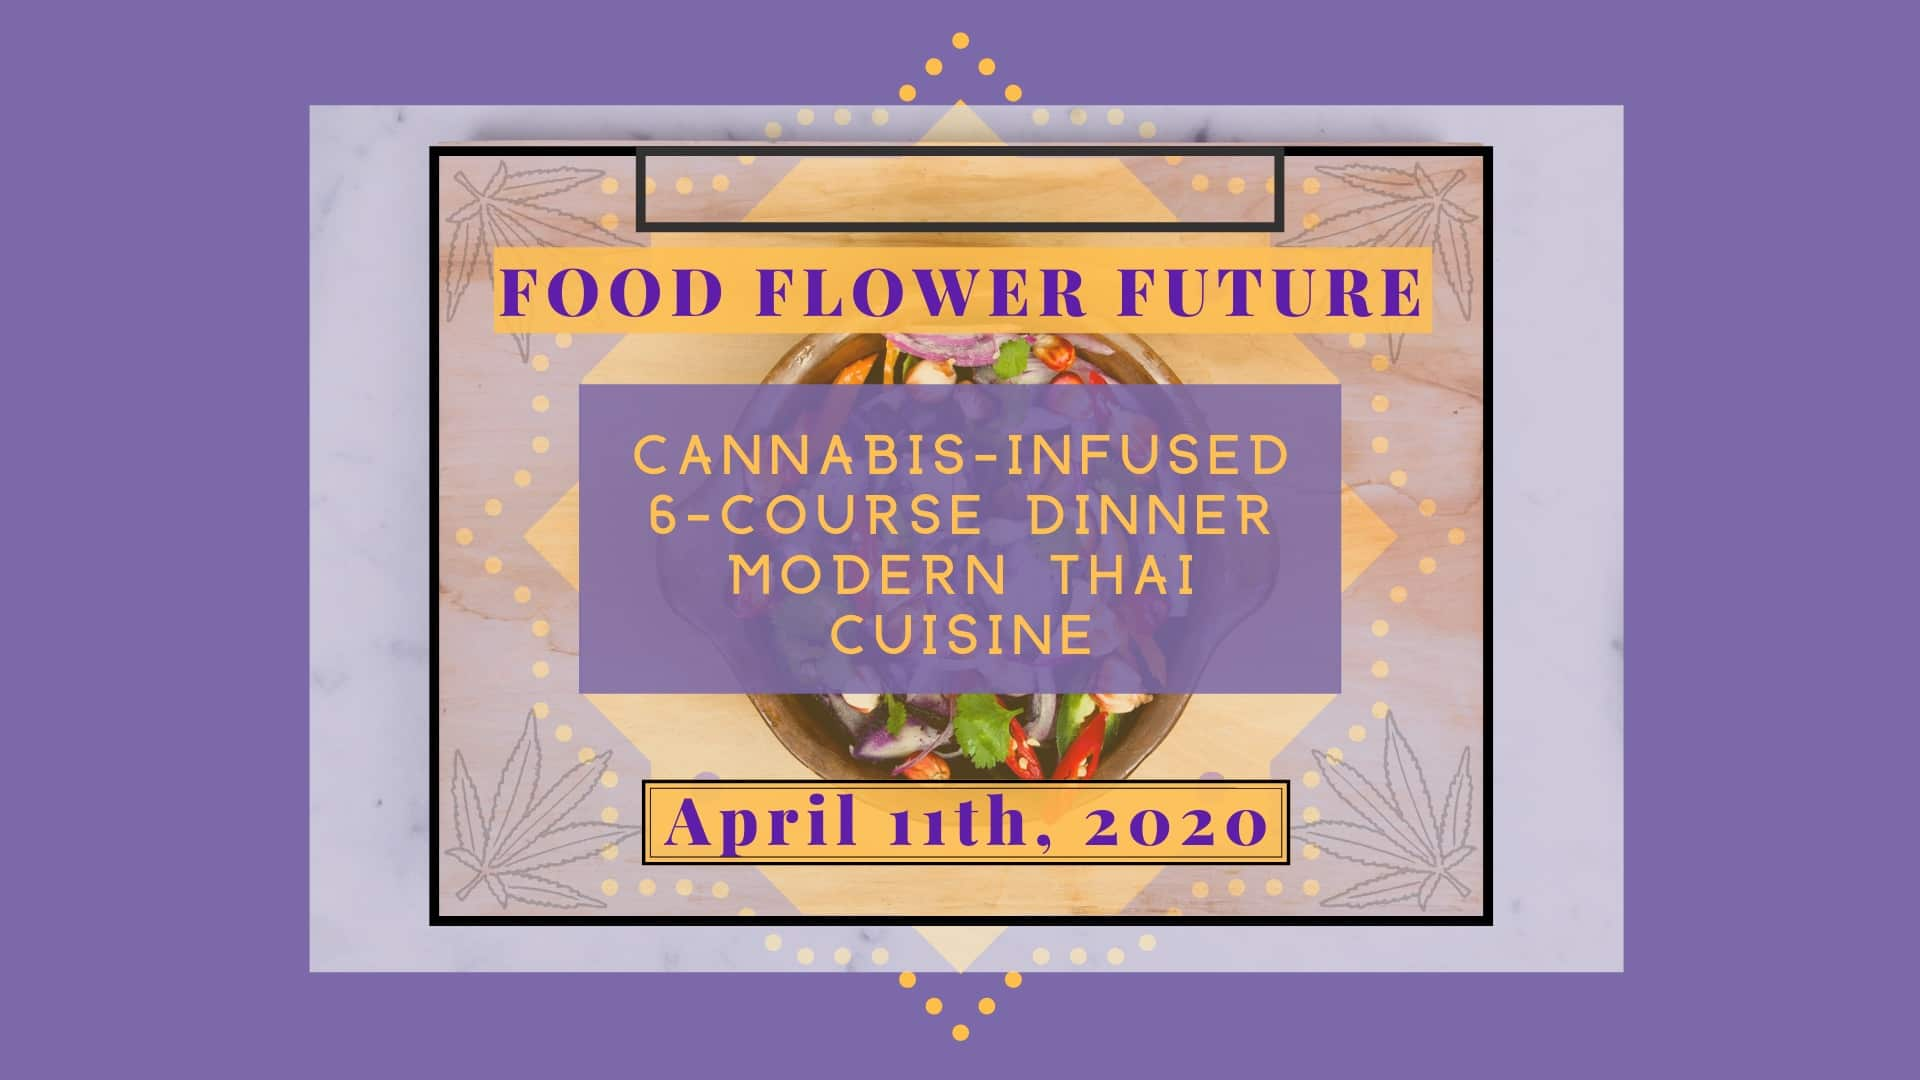 FOOD FLOWER FUTURE: CANNABIS INFUSED 6-COURSE THAI CUSINE